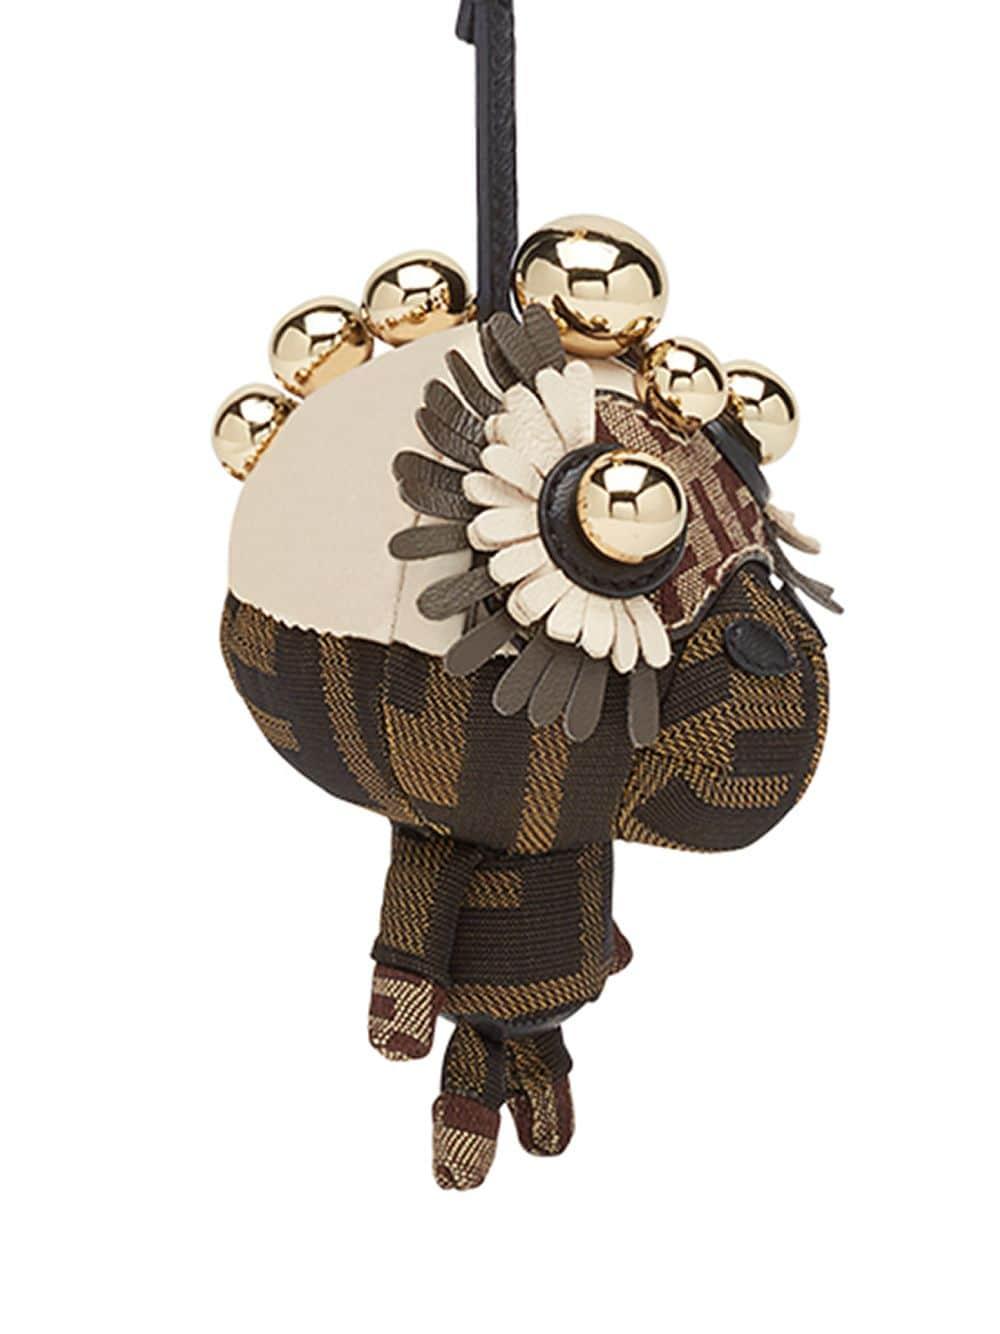 FENDI | Fendi подвеска на сумку 'Space Monkey' | Clouty